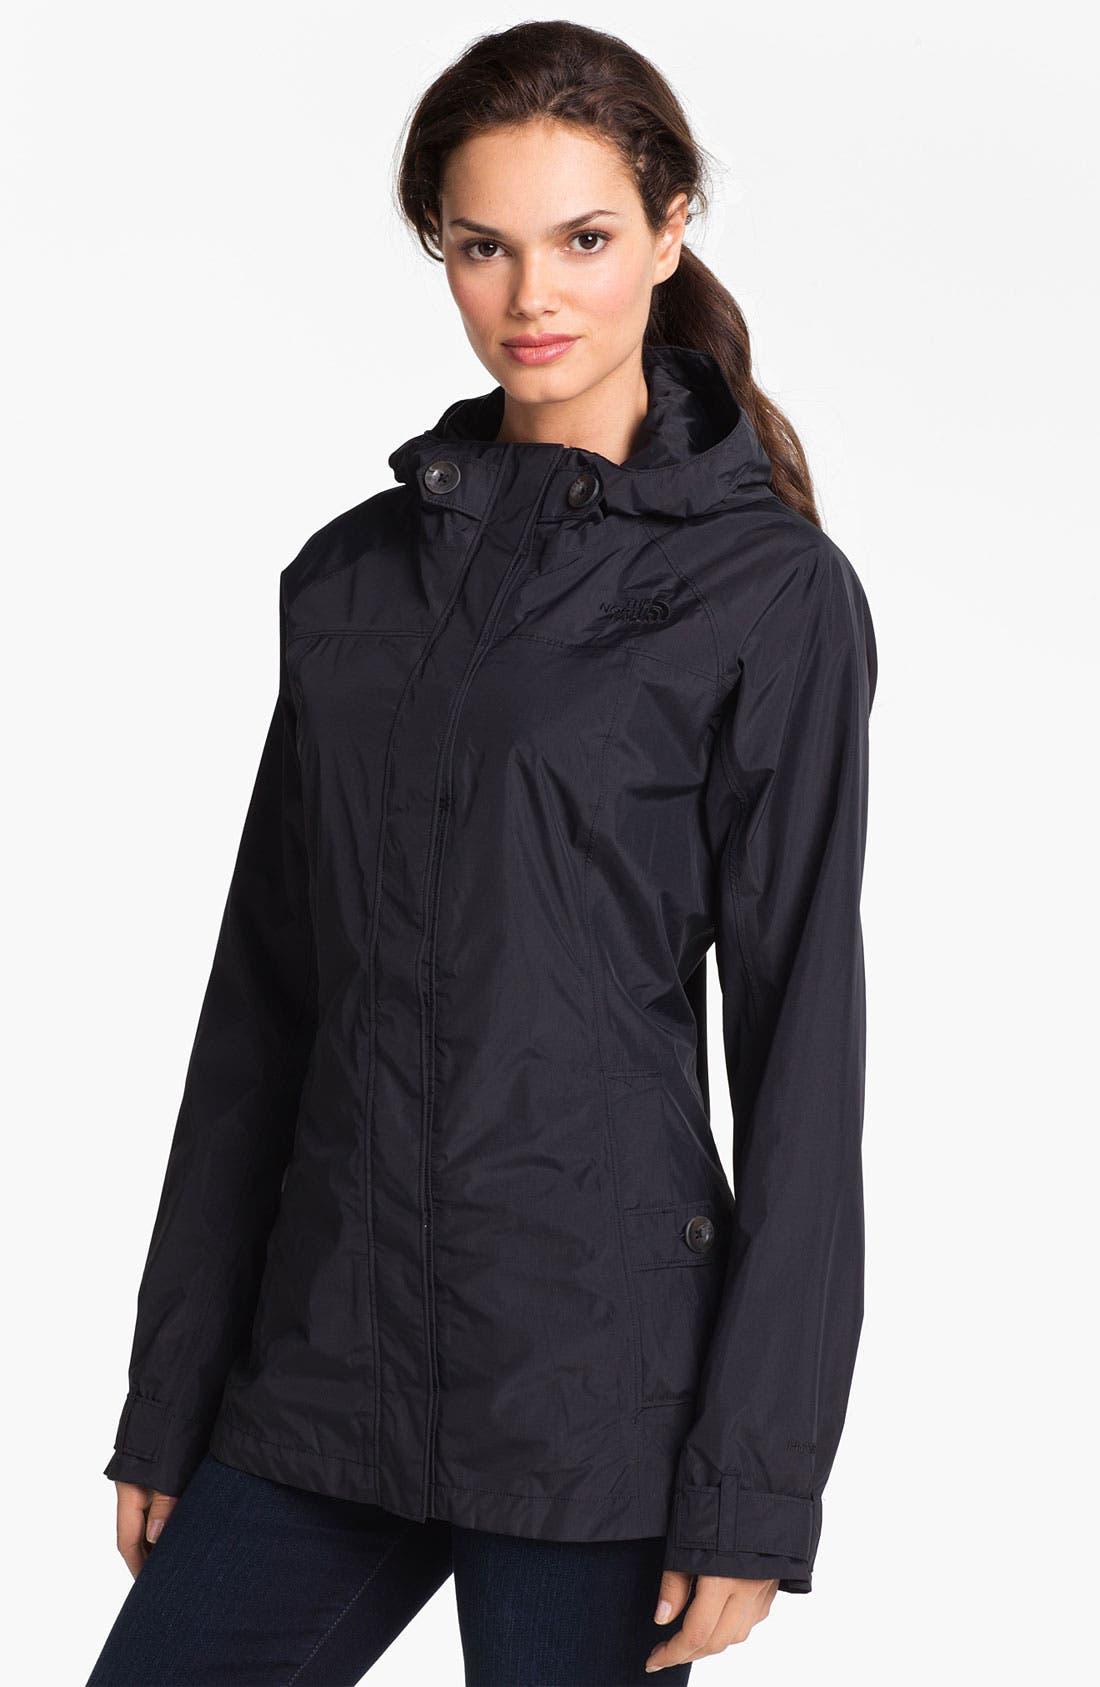 Main Image - The North Face 'Carli' Rain Jacket